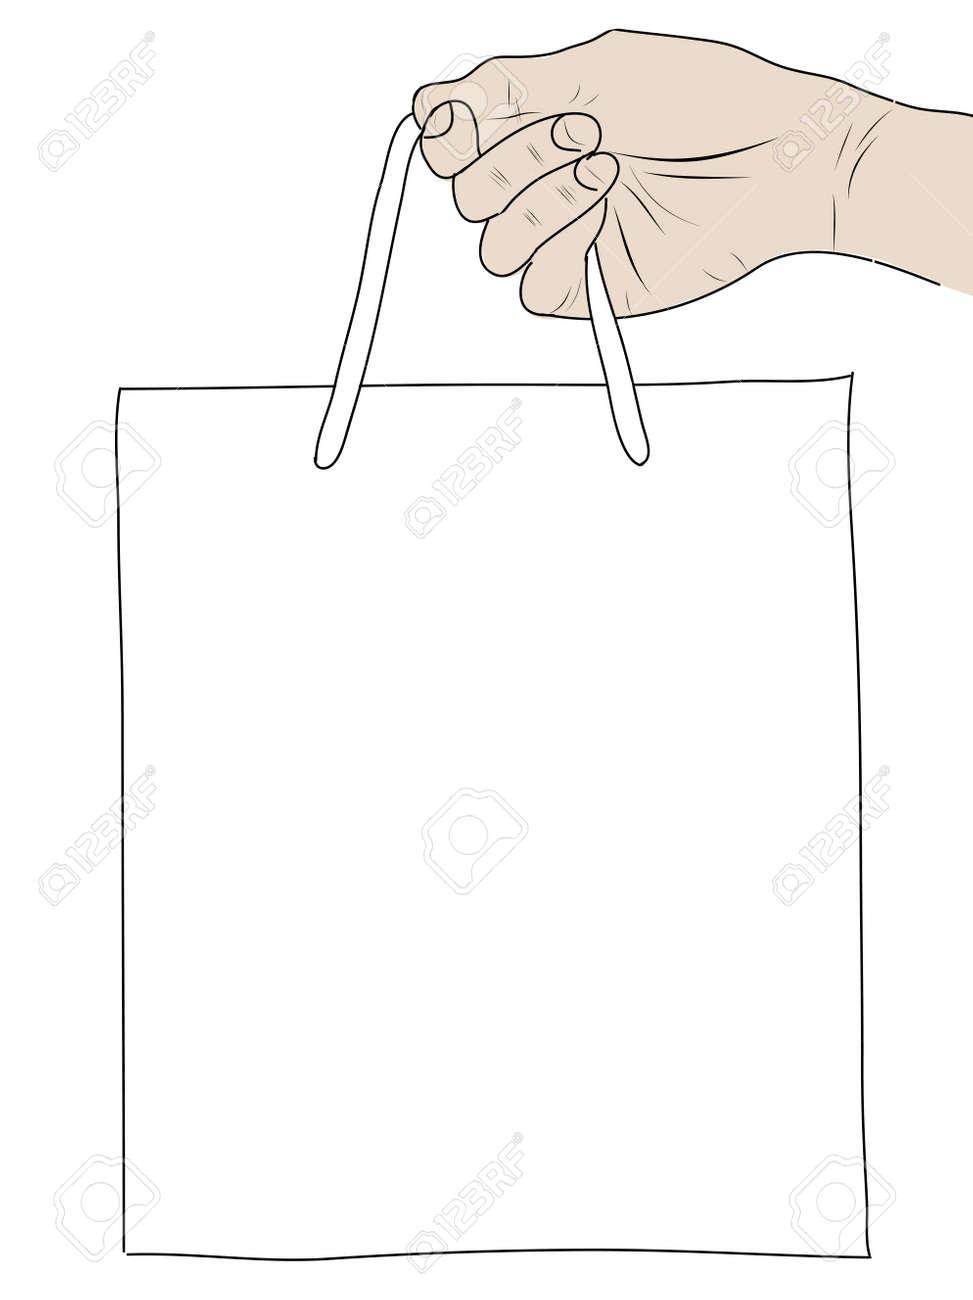 hand drawning  Shopping Bag Stock Photo - 17576536